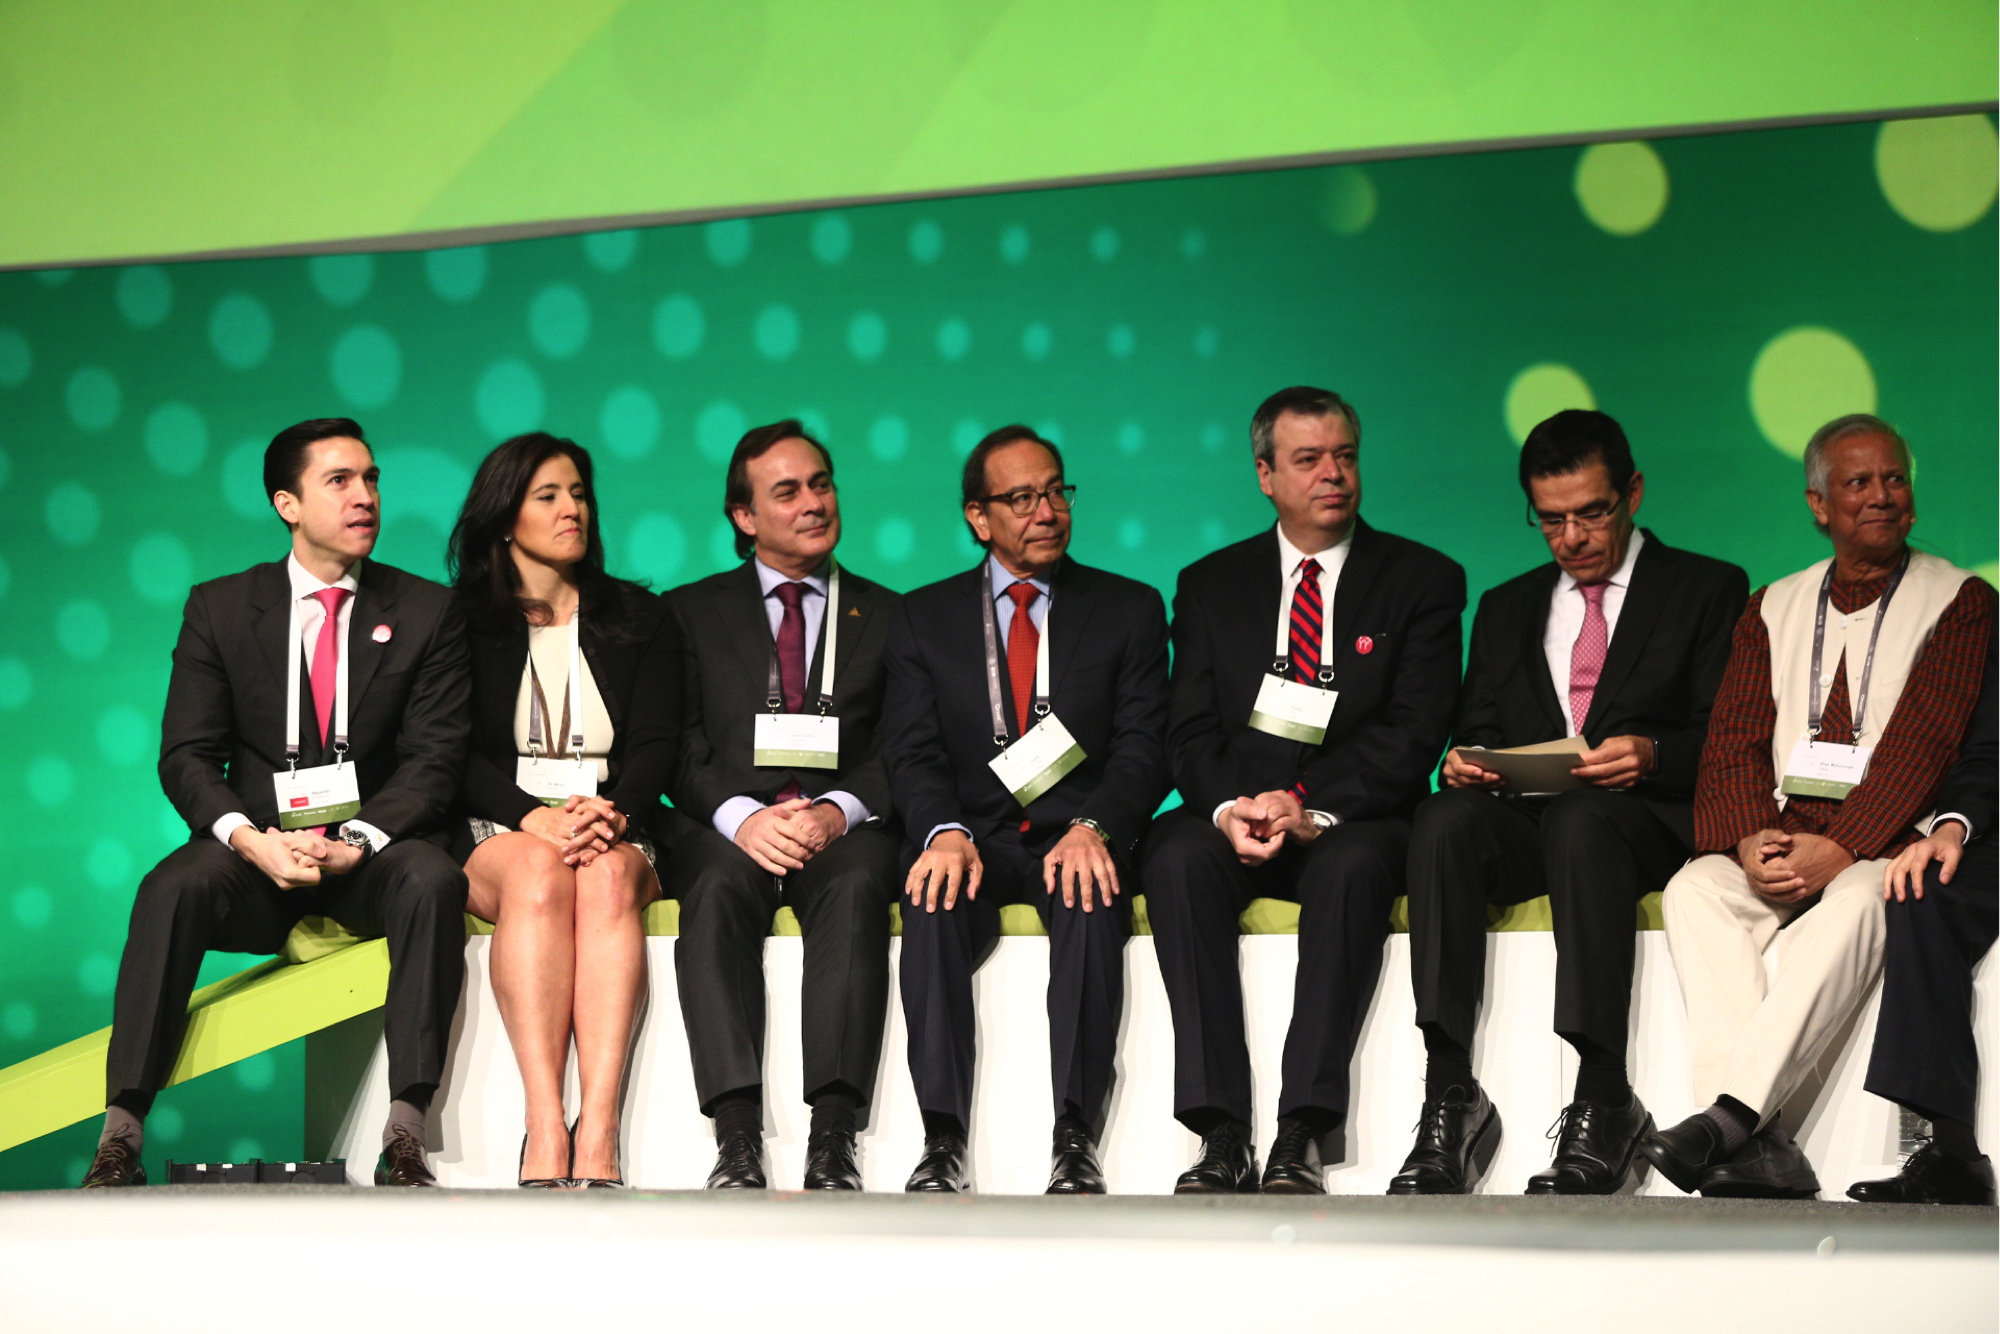 social business summit panel